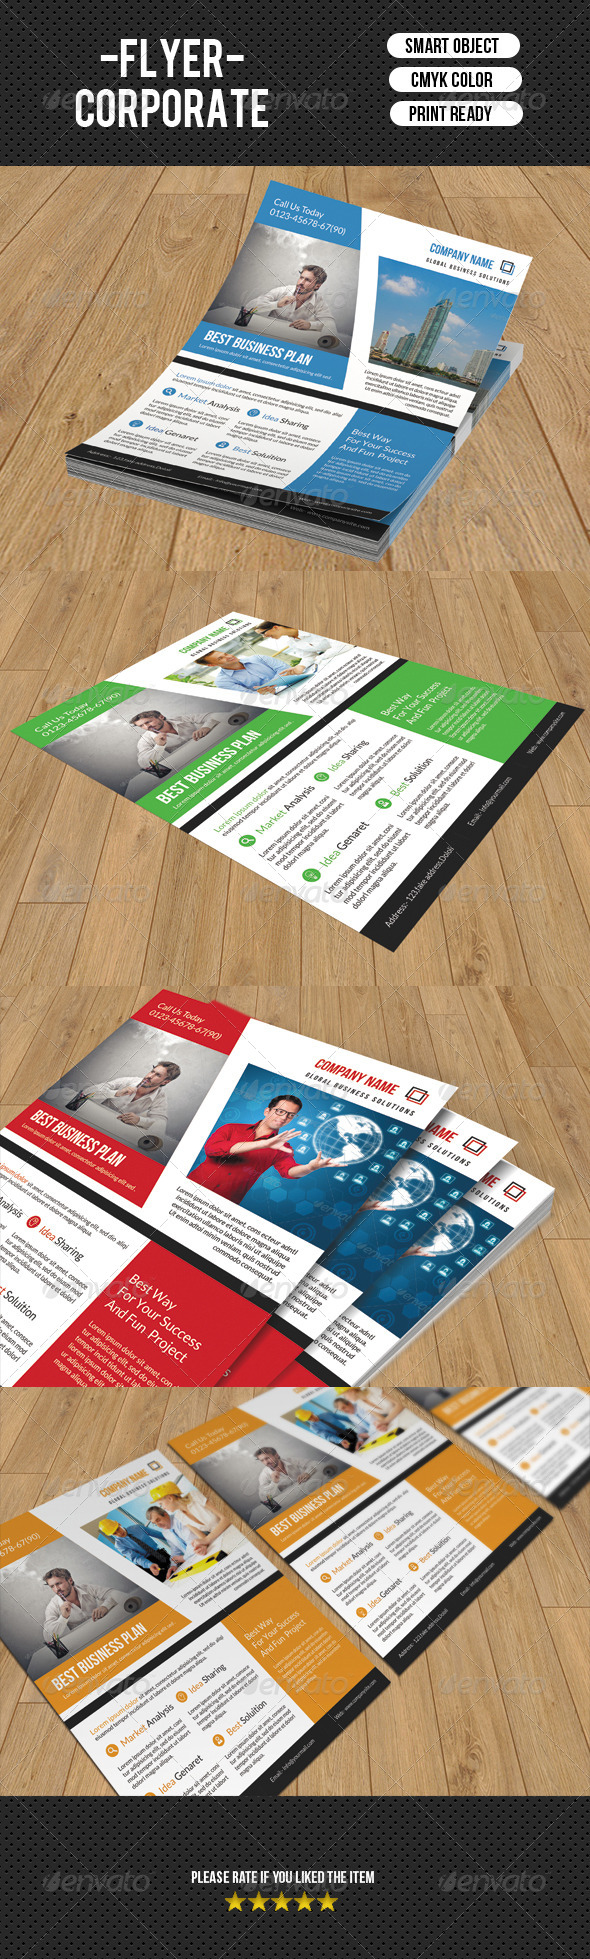 GraphicRiver Corporate Flyer Template-V75 8190520